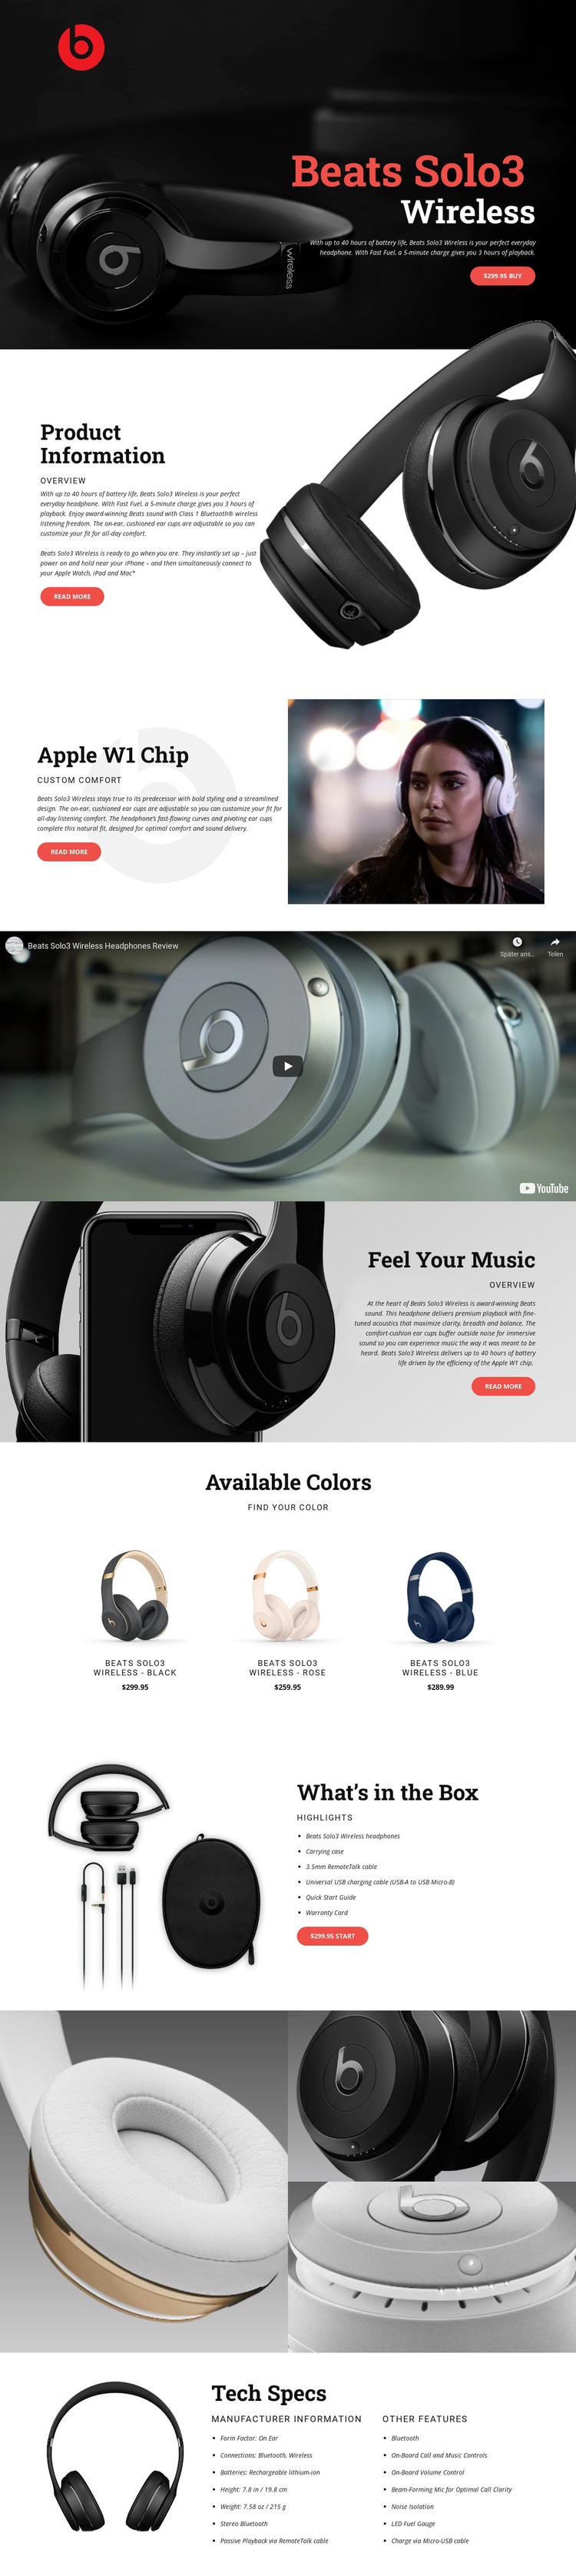 Outstanding quality of music WordPress Theme